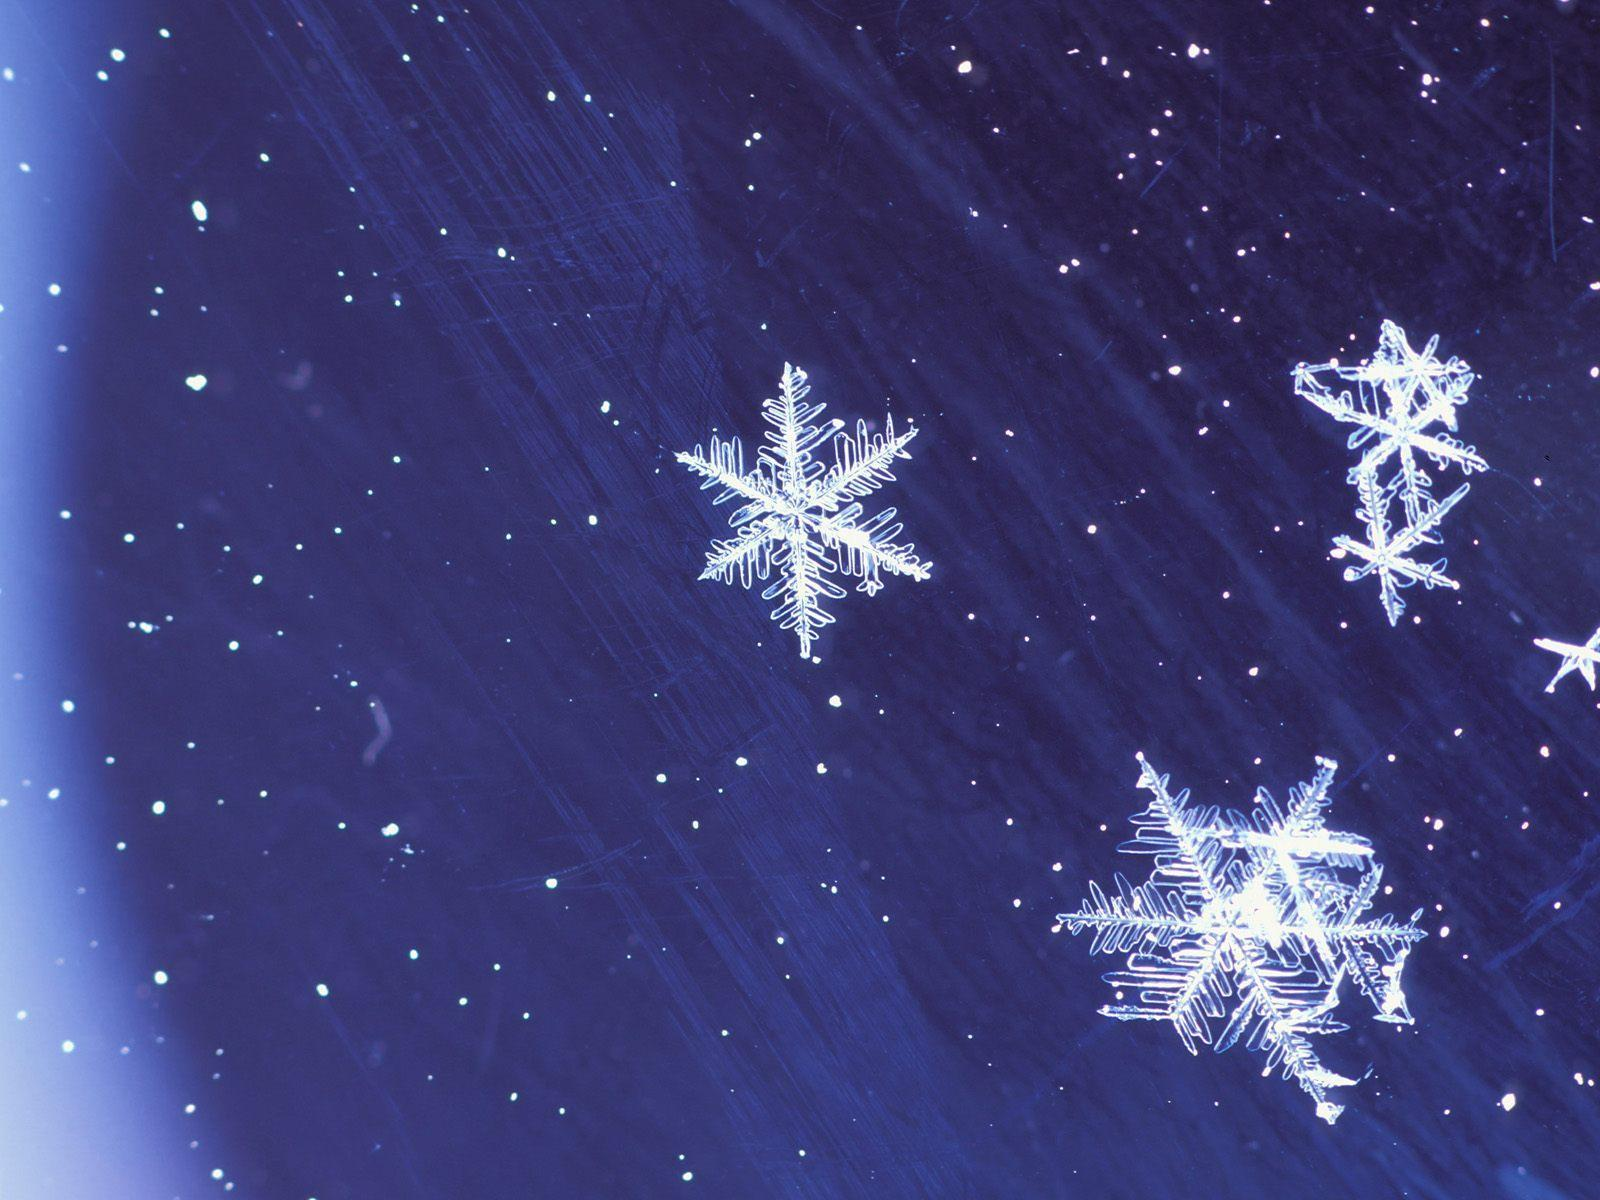 Christmas HQ wallpapers   Christmas Wallpaper 2768064 1600x1200